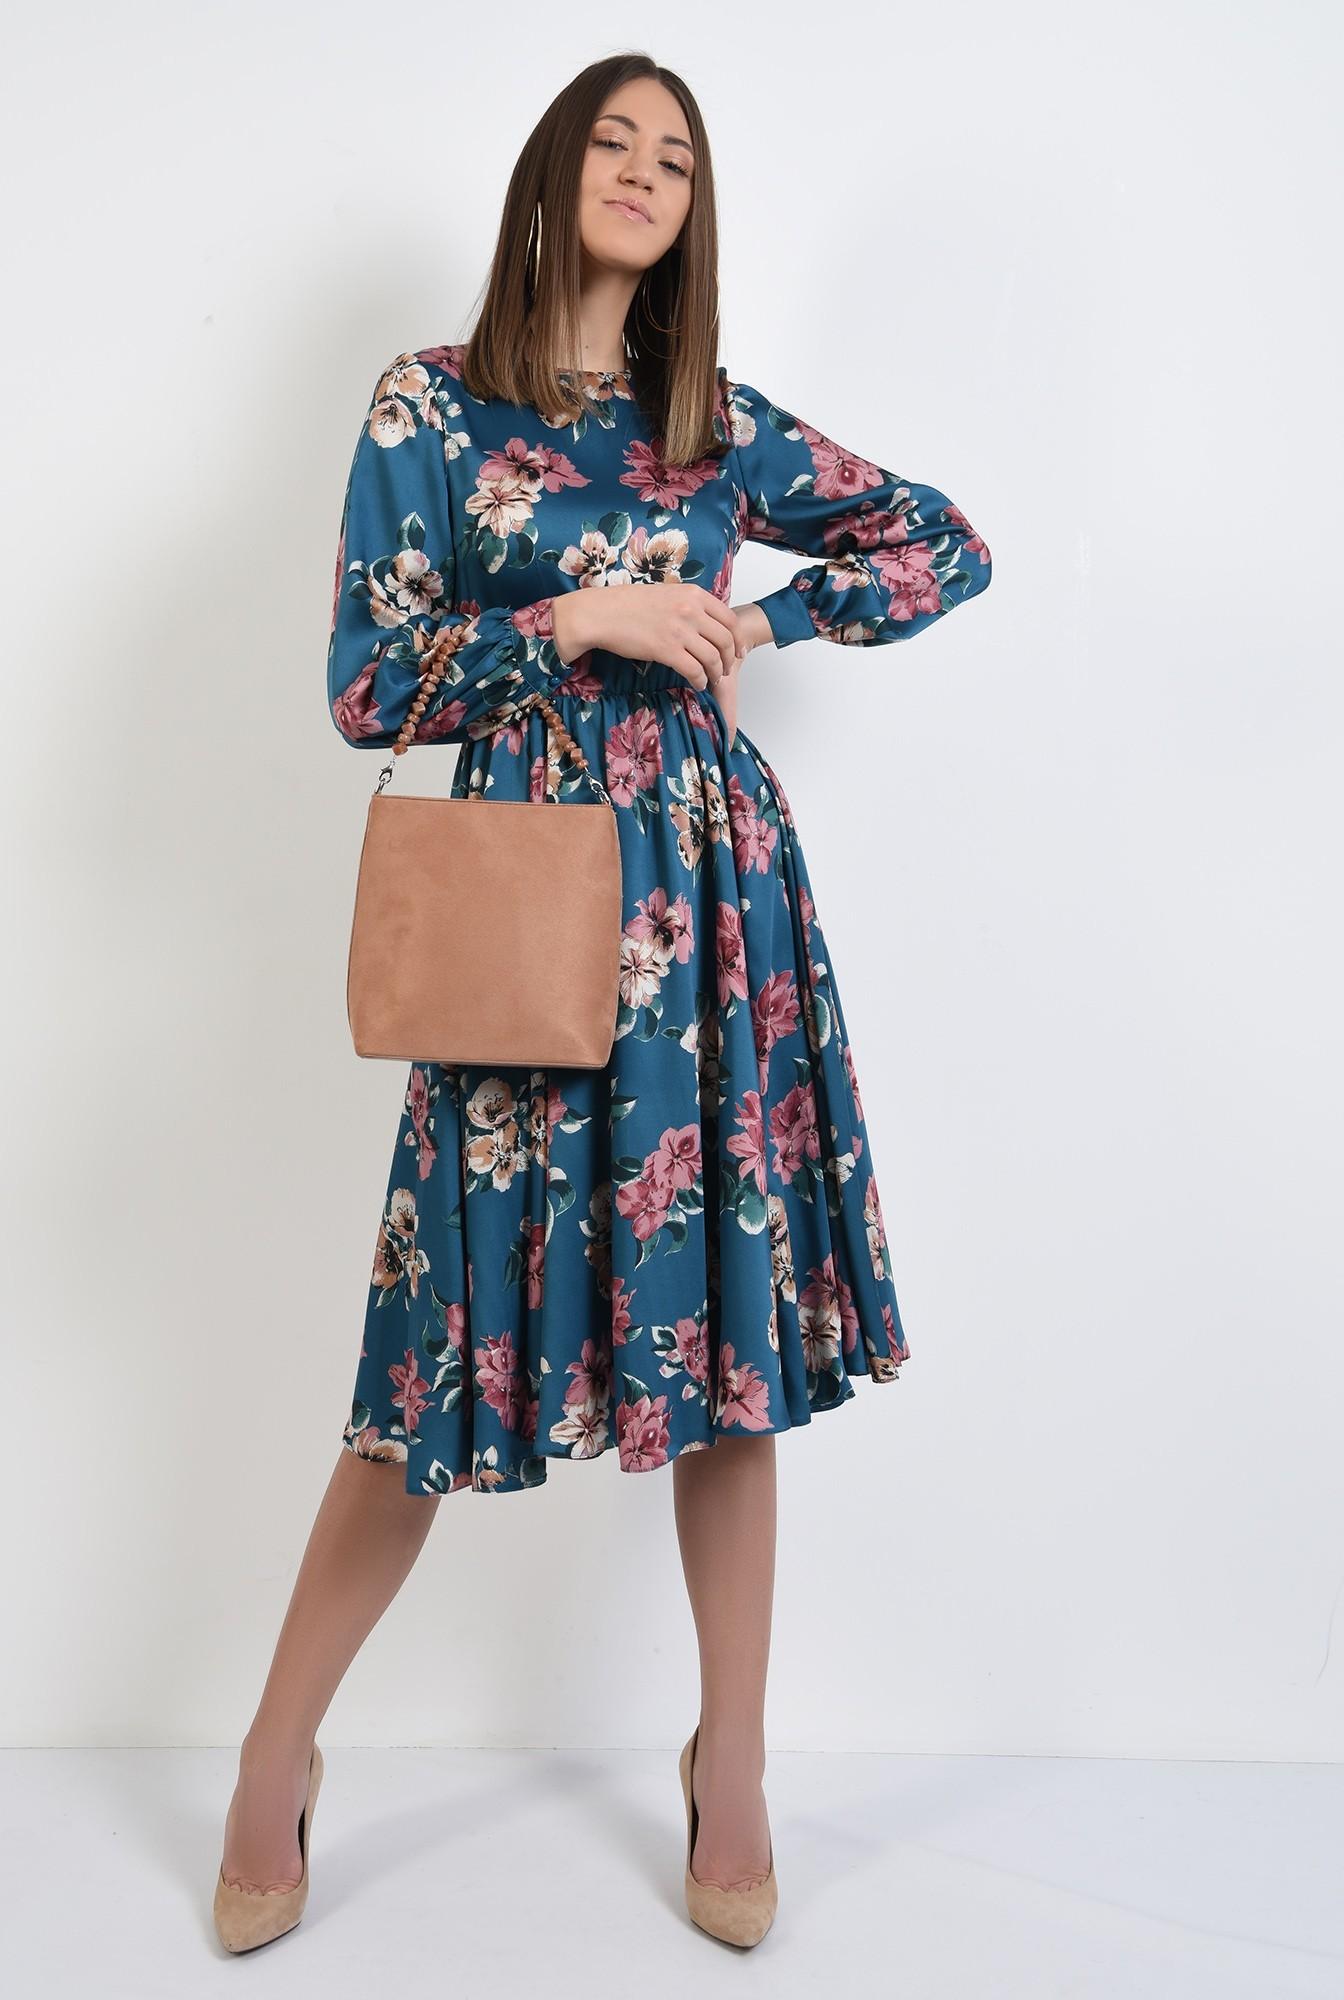 3 - 360 - rochie de primavara, clos, cu imprimeu floral, evazata, maneci lungi bufante